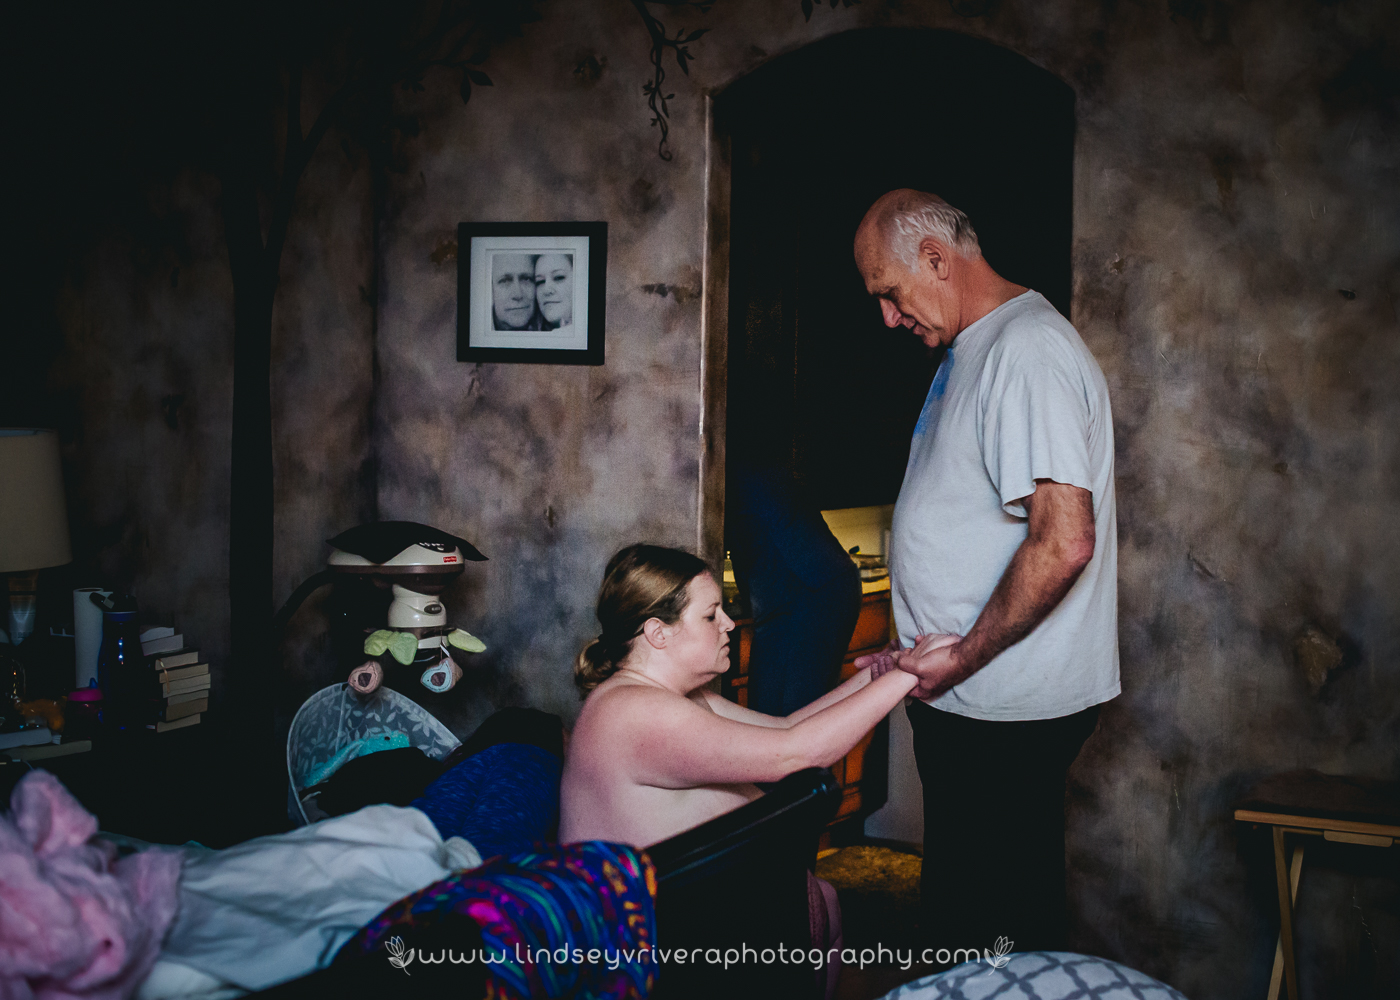 Home-Birth-Born-Photography-Salt-Lake-City,-Wasatch-Midwifery-&-Wellness,-Just-Born7.jpg